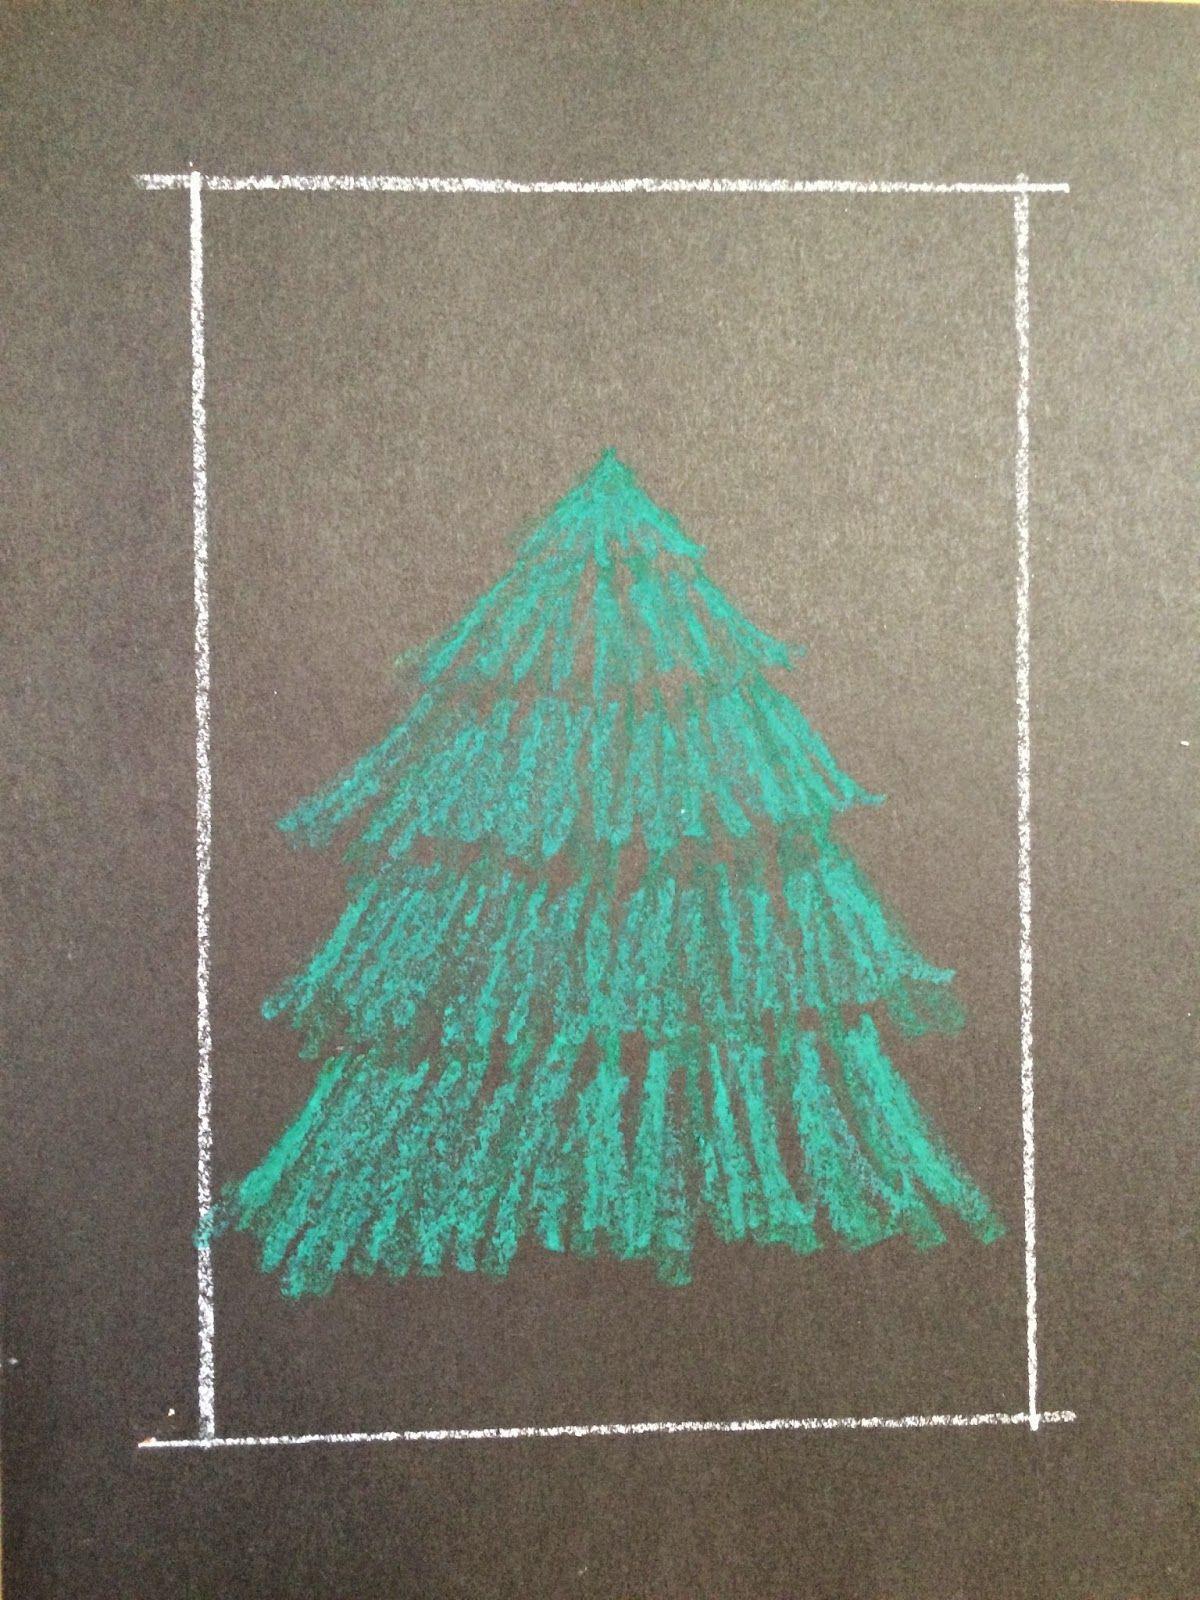 Kathyu0027s AngelNik Designs U0026 Art Project Ideas: Oil Pastel Christmas Tree In  A Snowstorm